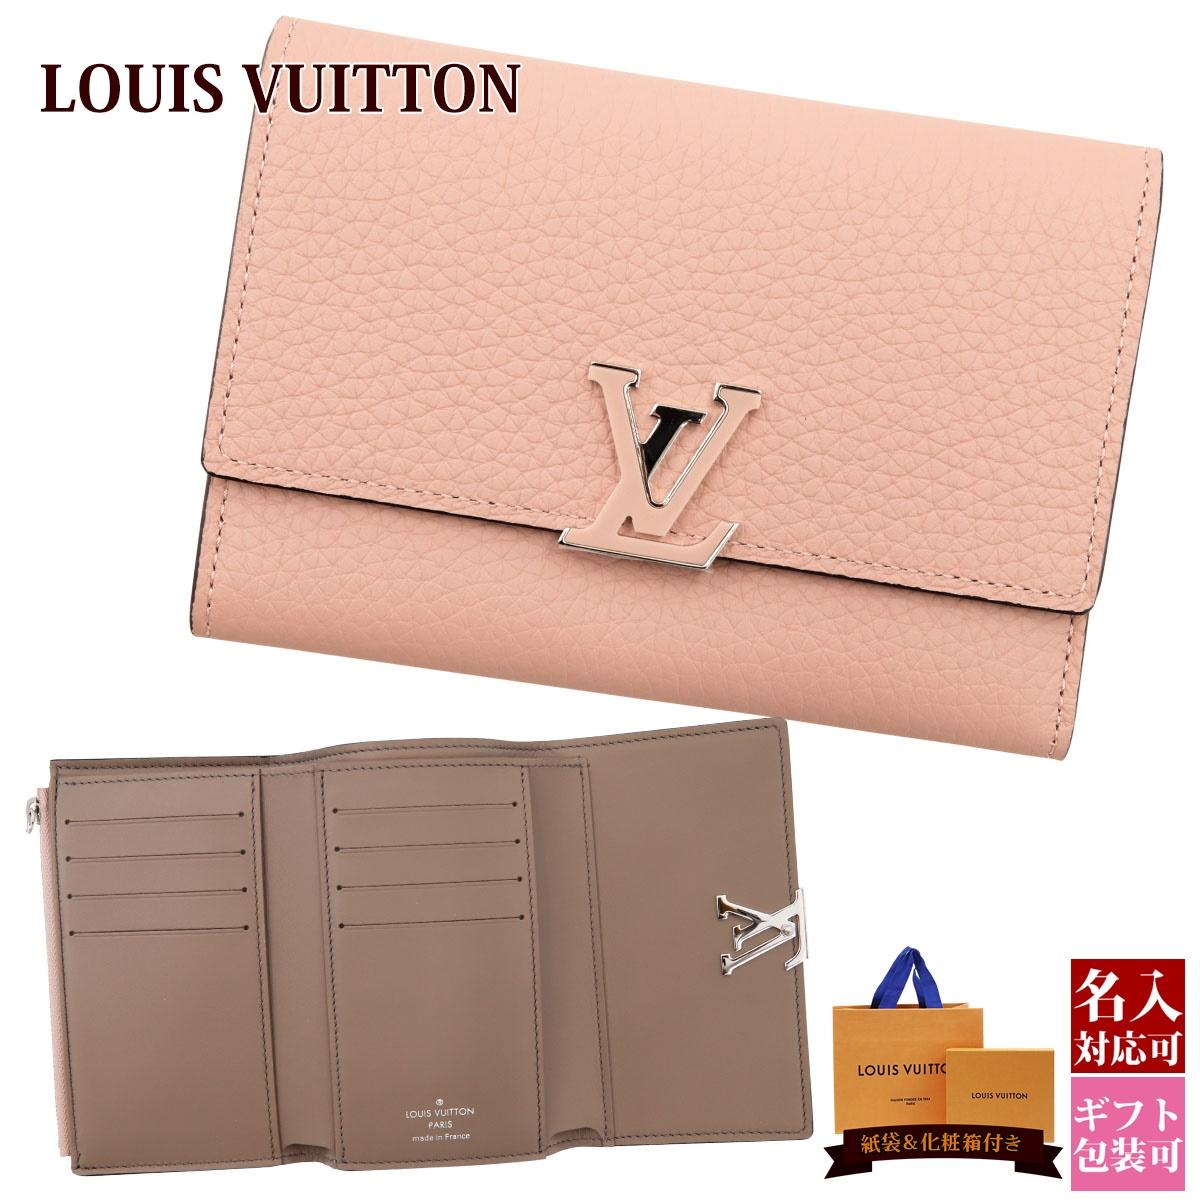 online retailer 38f9e 27d9c ルイヴィトン デュベチカ 財布 カルティエ 折財布 ...